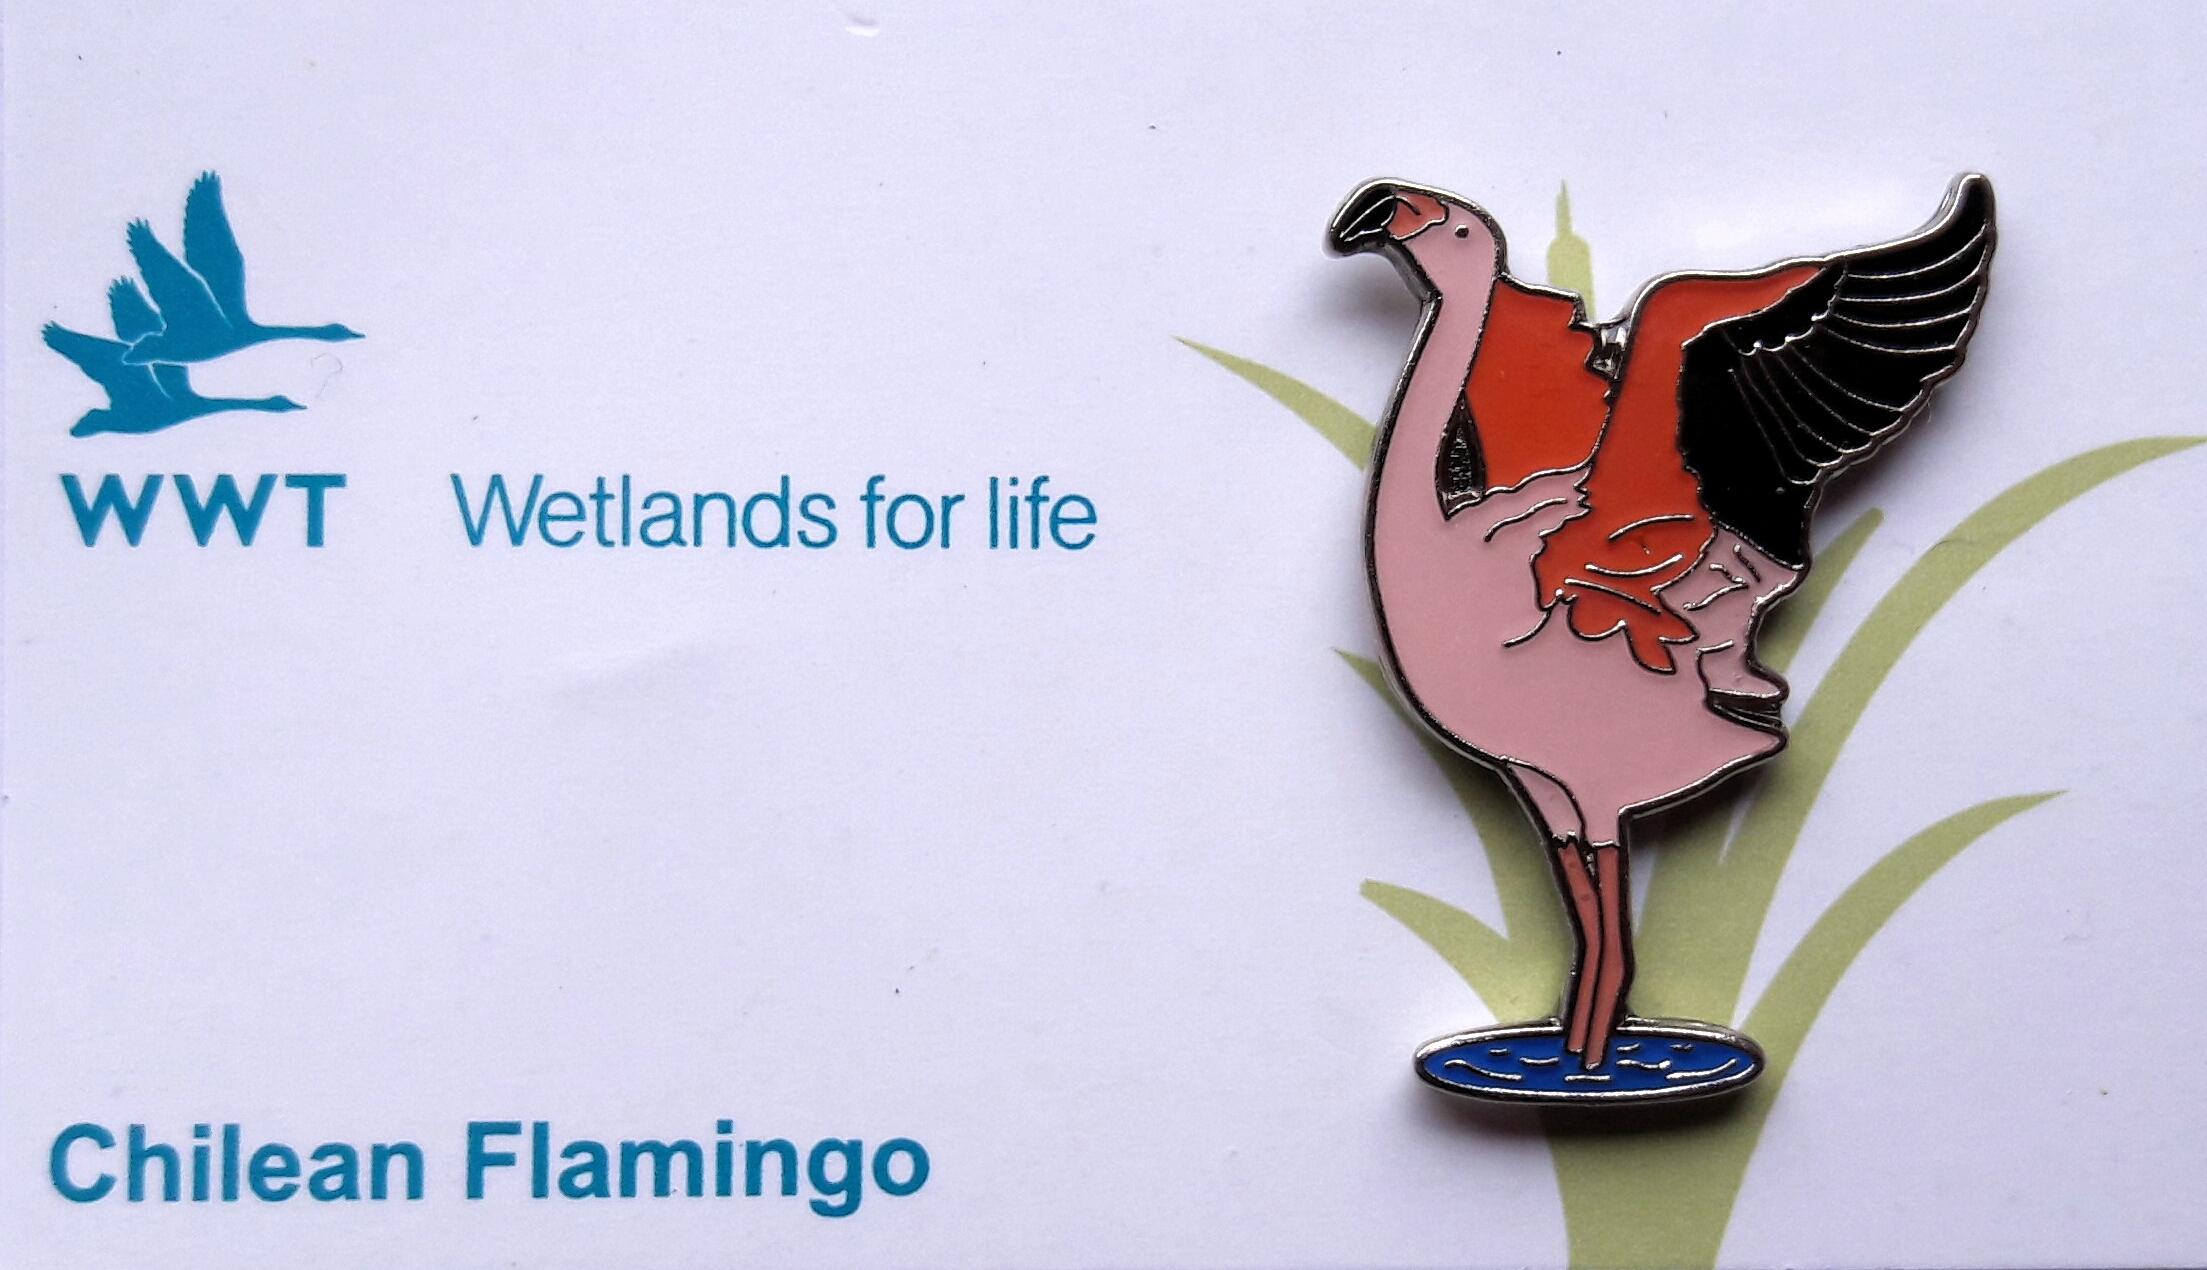 WWT Chilean Flamingo